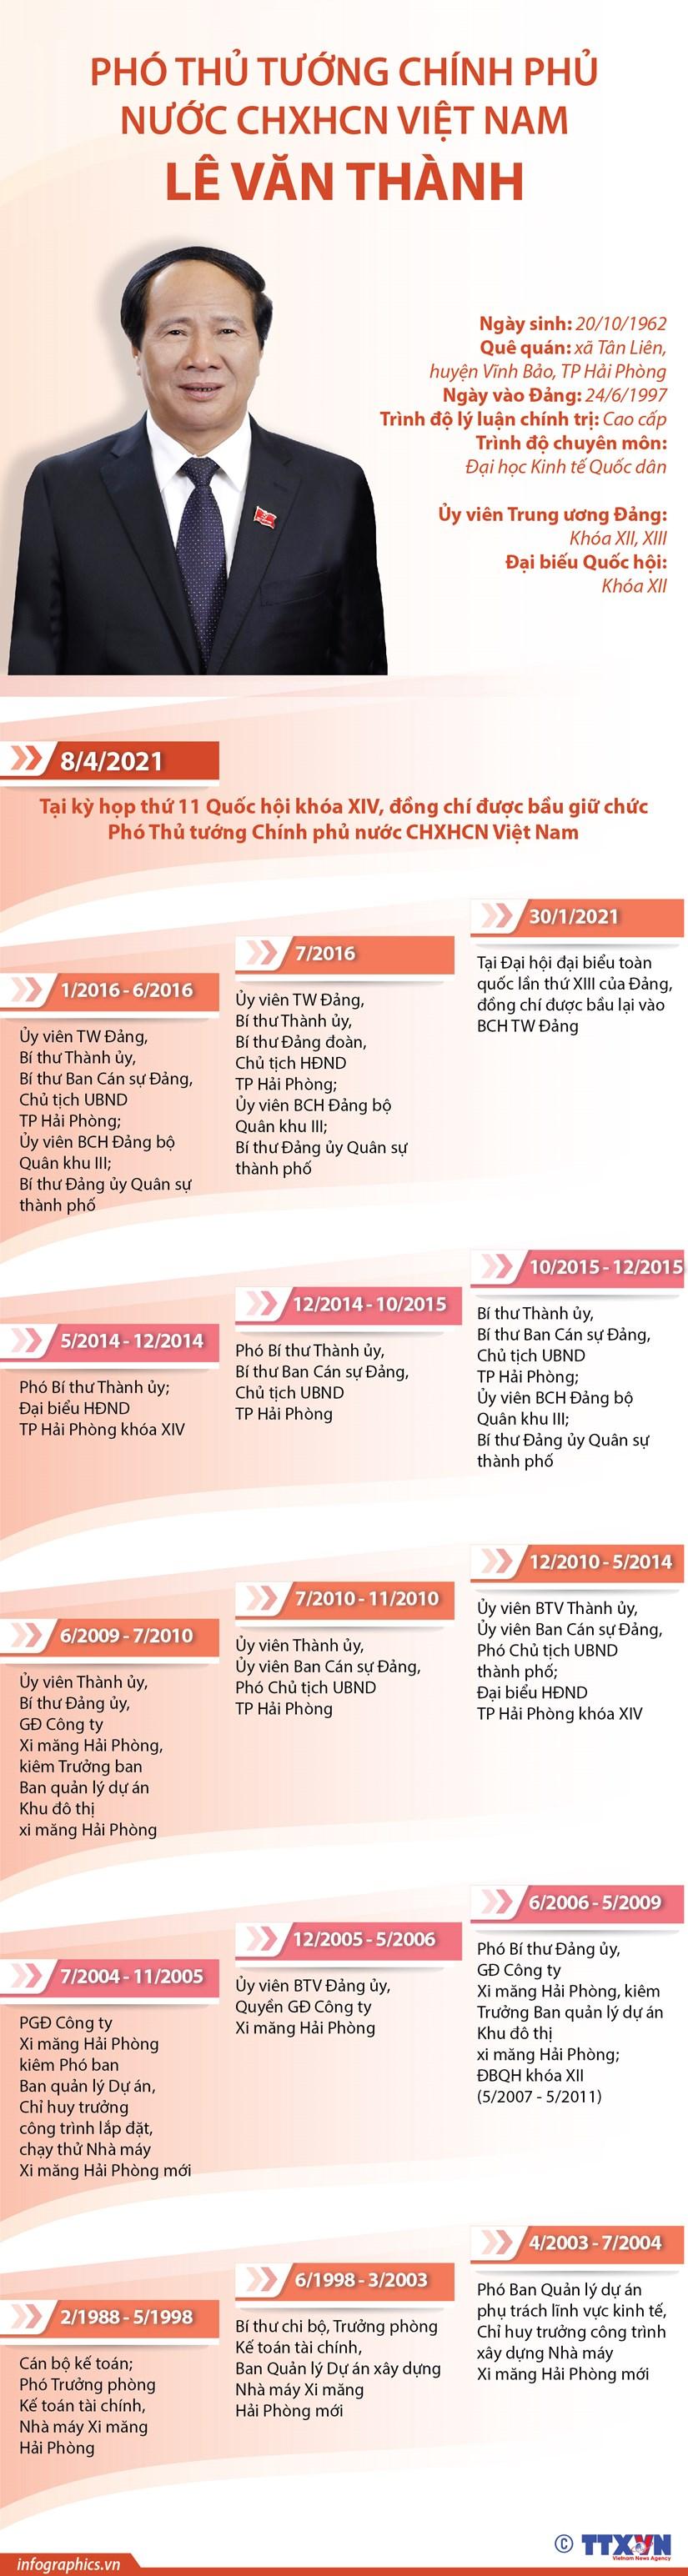 [Infographics] Chan dung Pho Thu tuong Chinh phu Le Van Thanh hinh anh 1